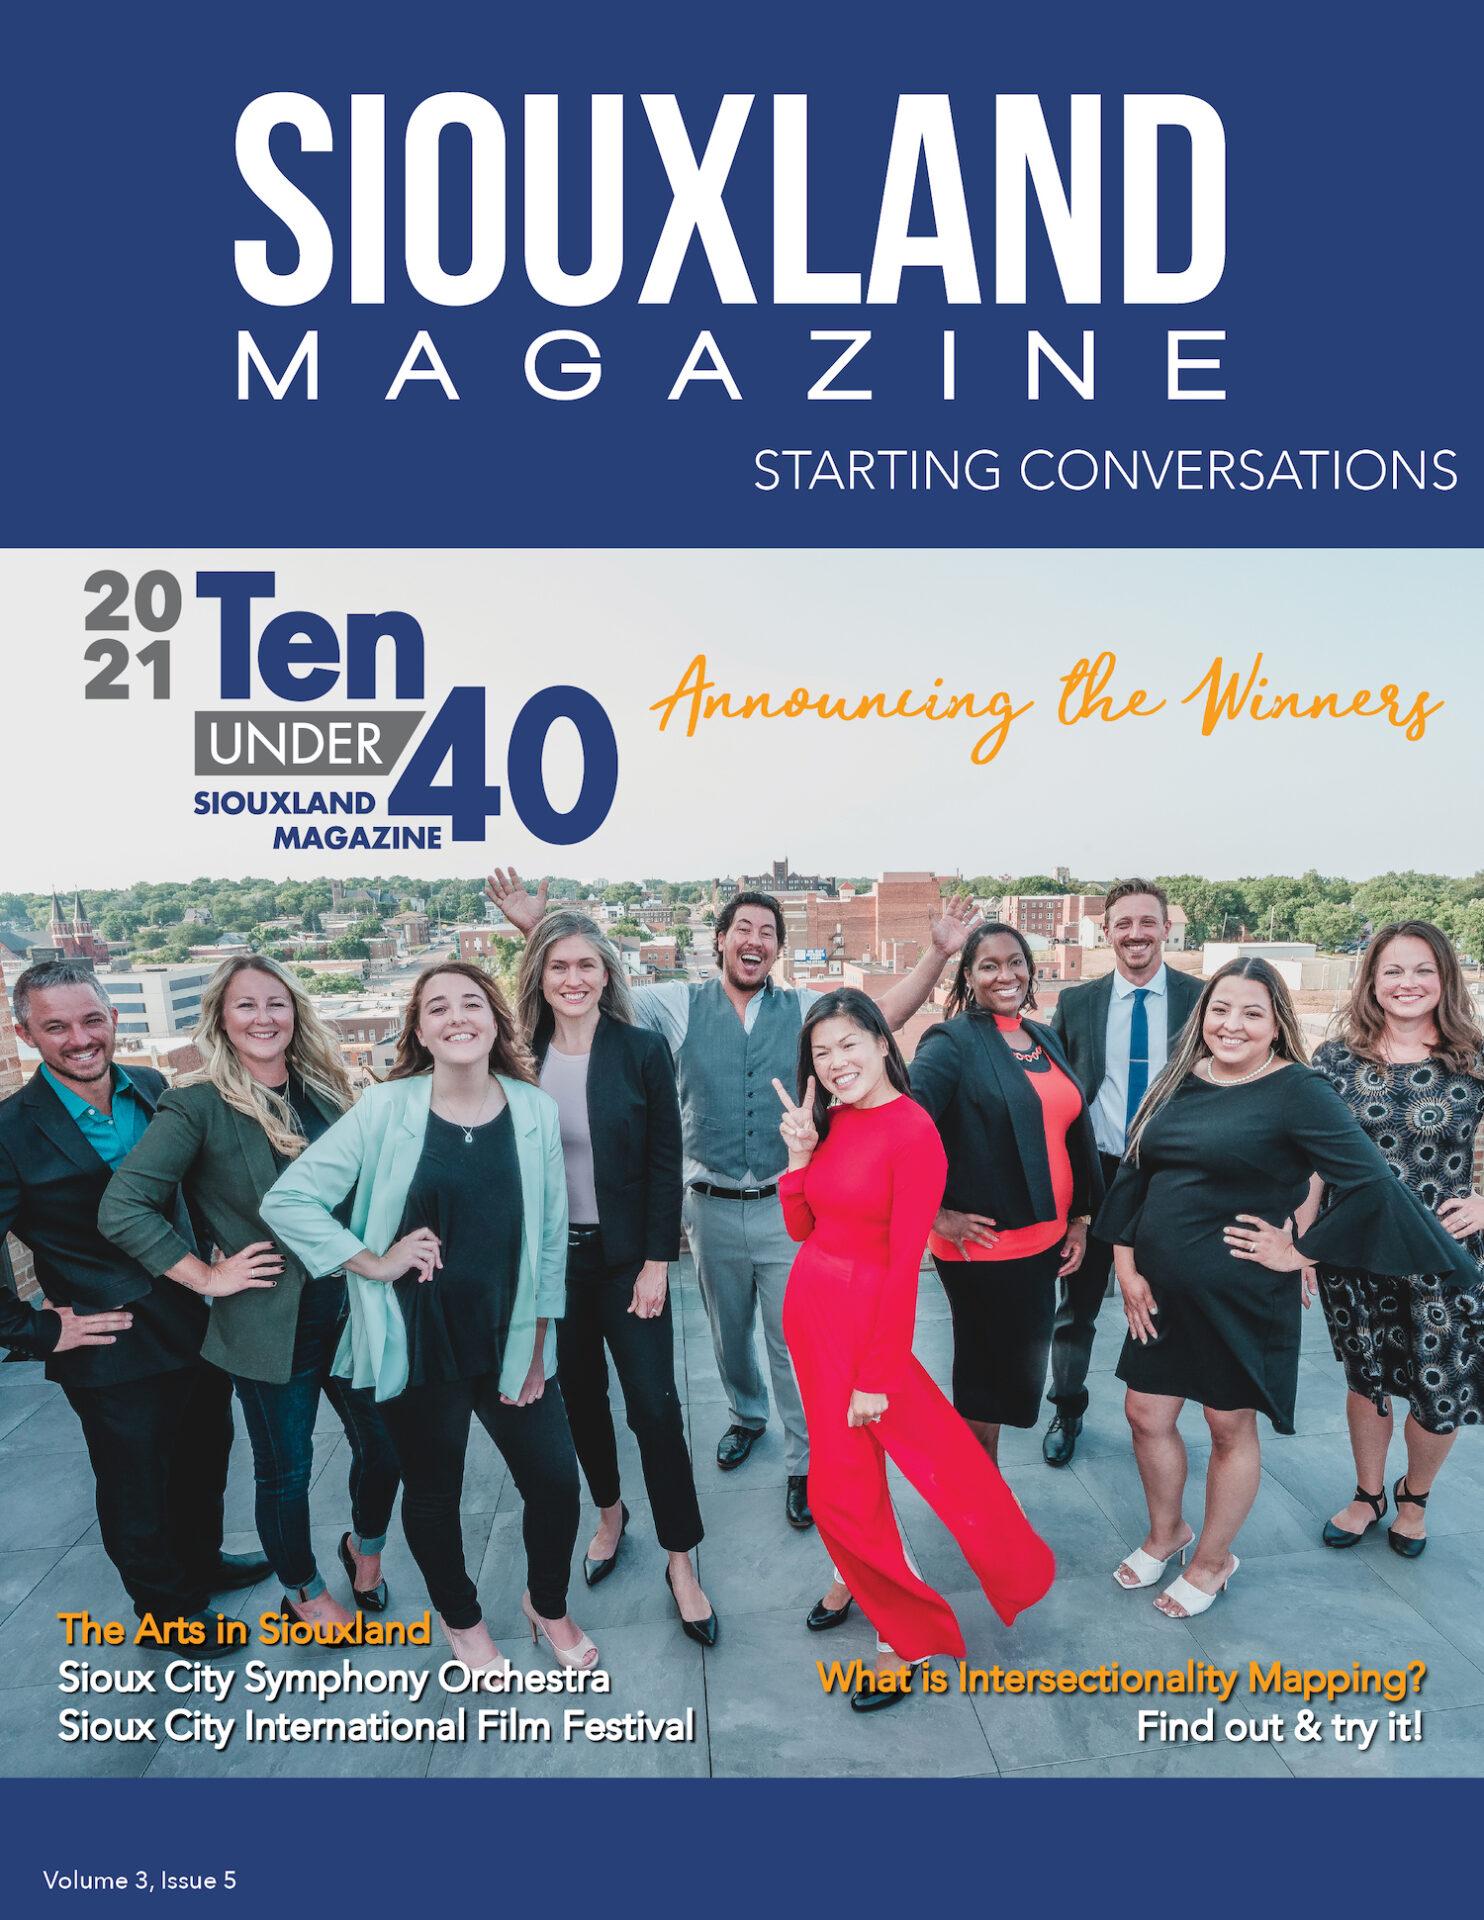 Siouxland Magazine September 2021 cover image